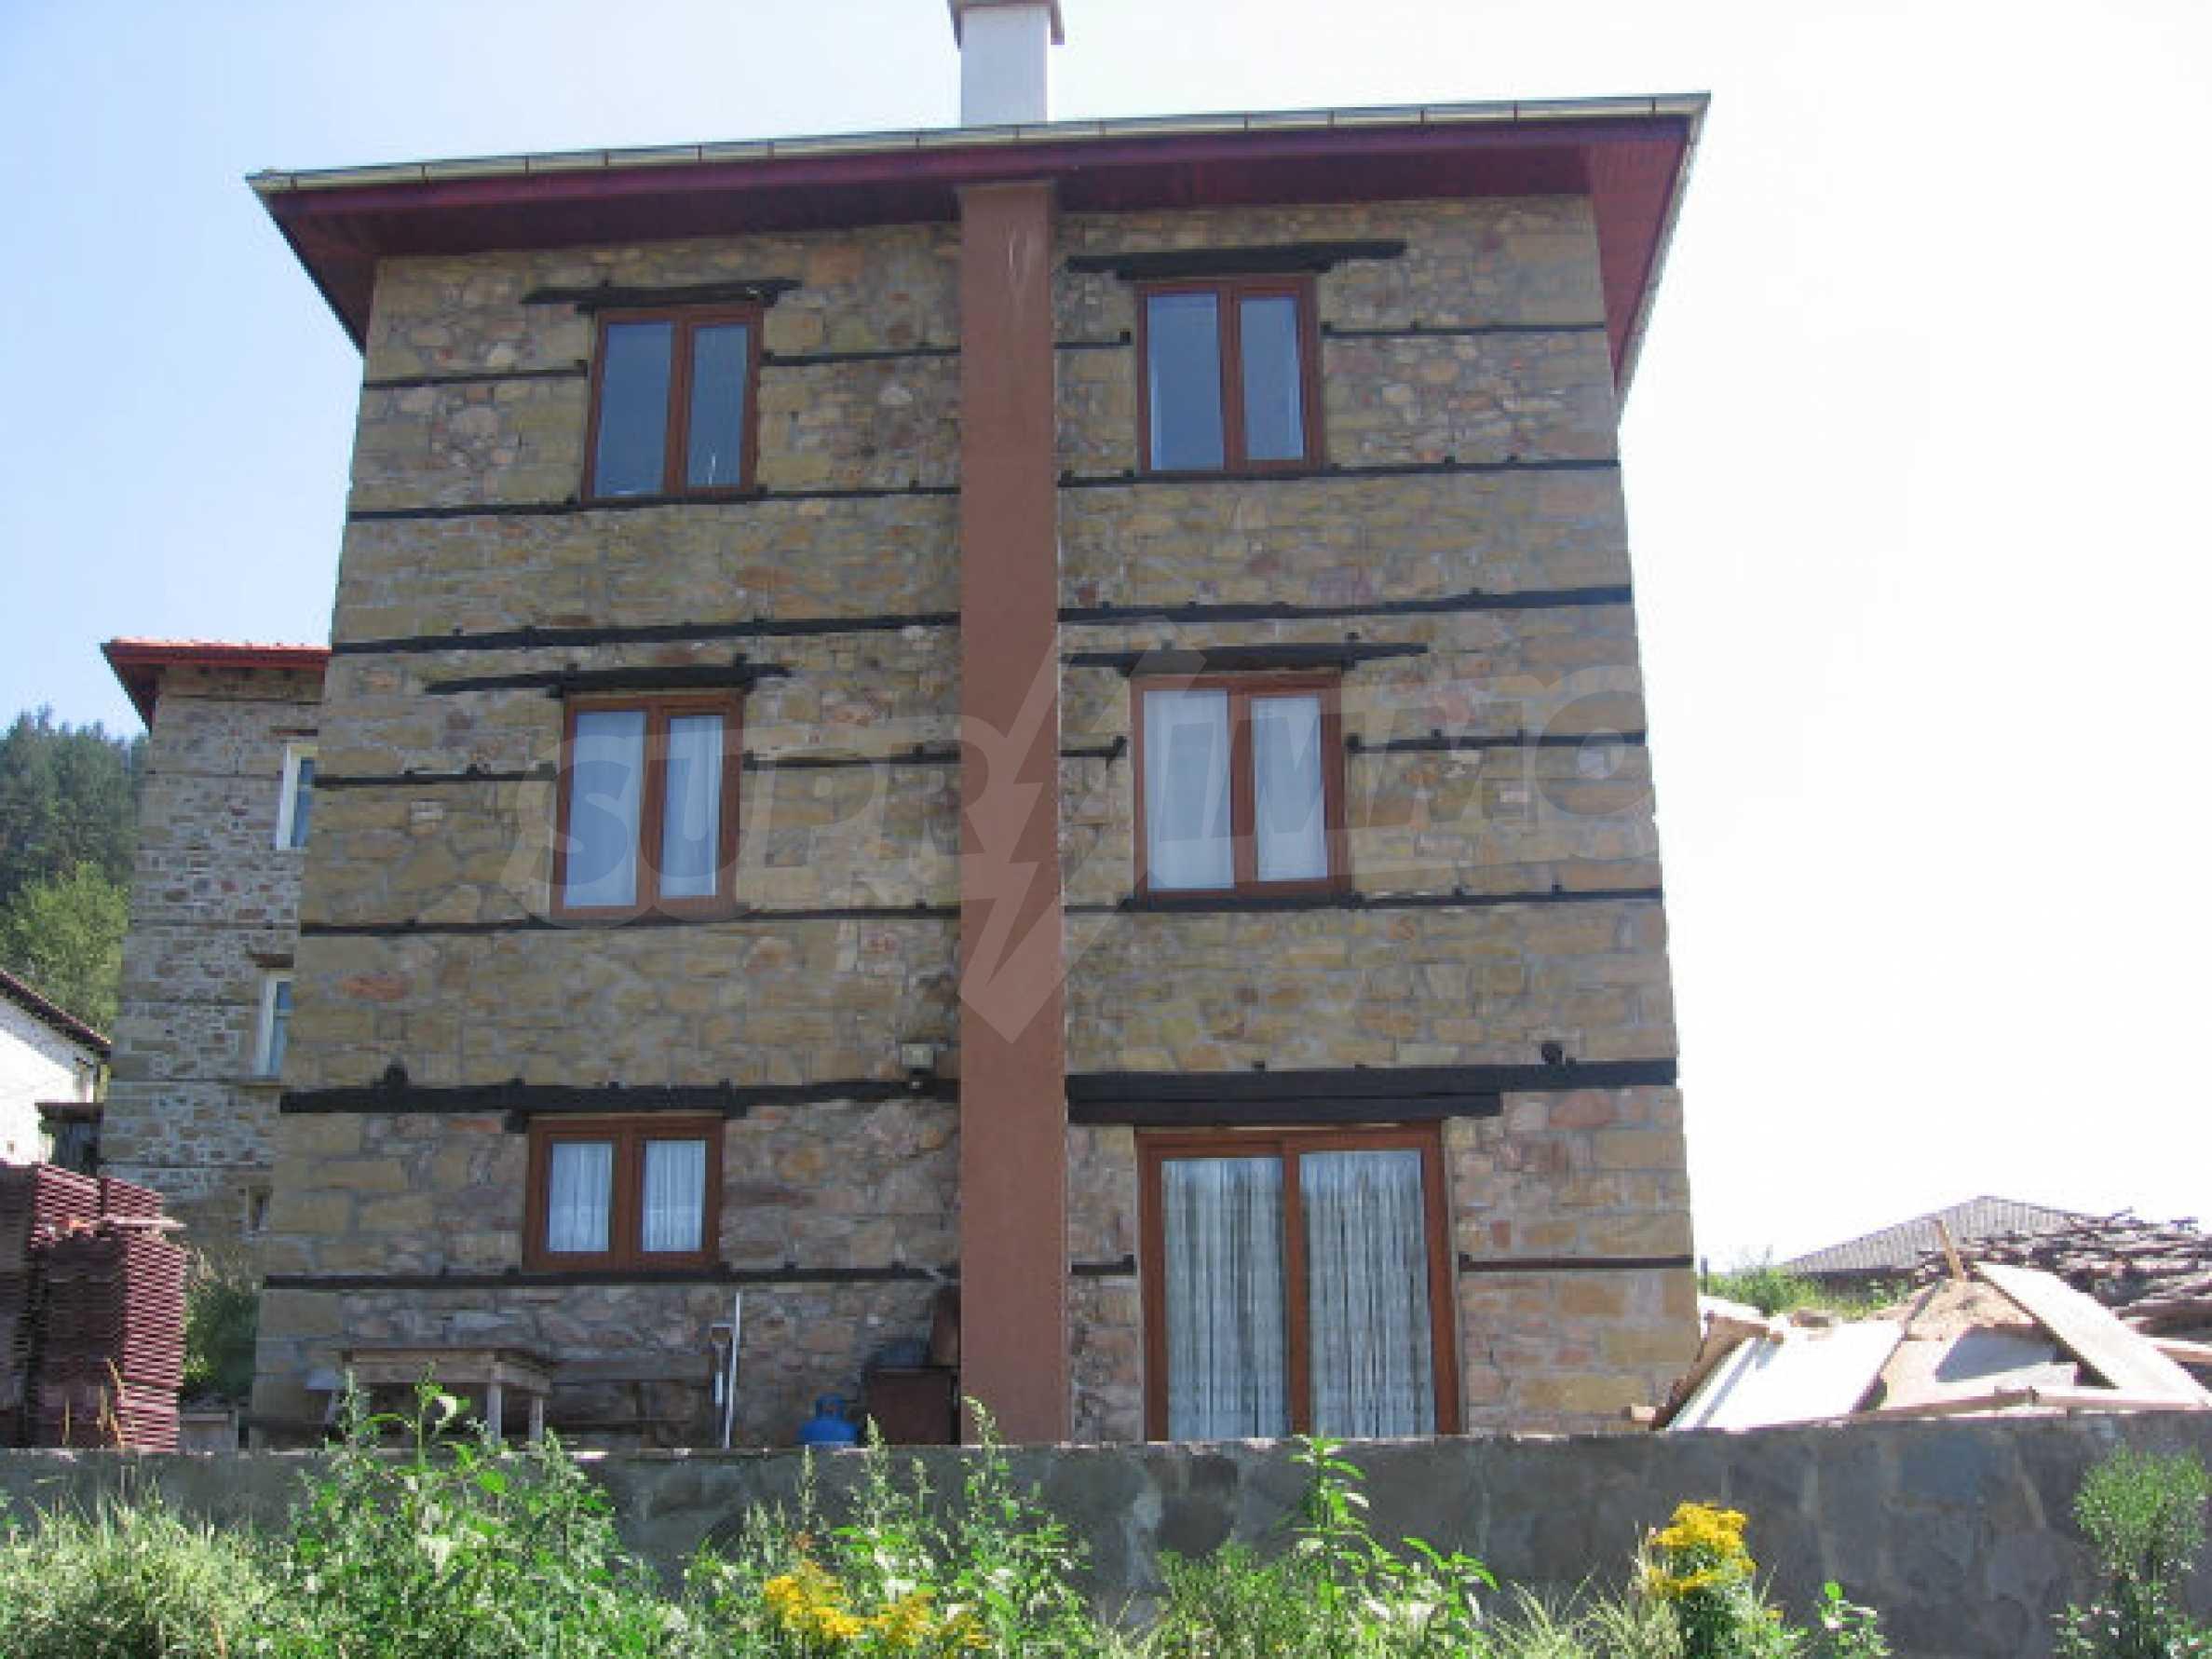 Restored and furnished three-storey house in a quiet village near Smolyan